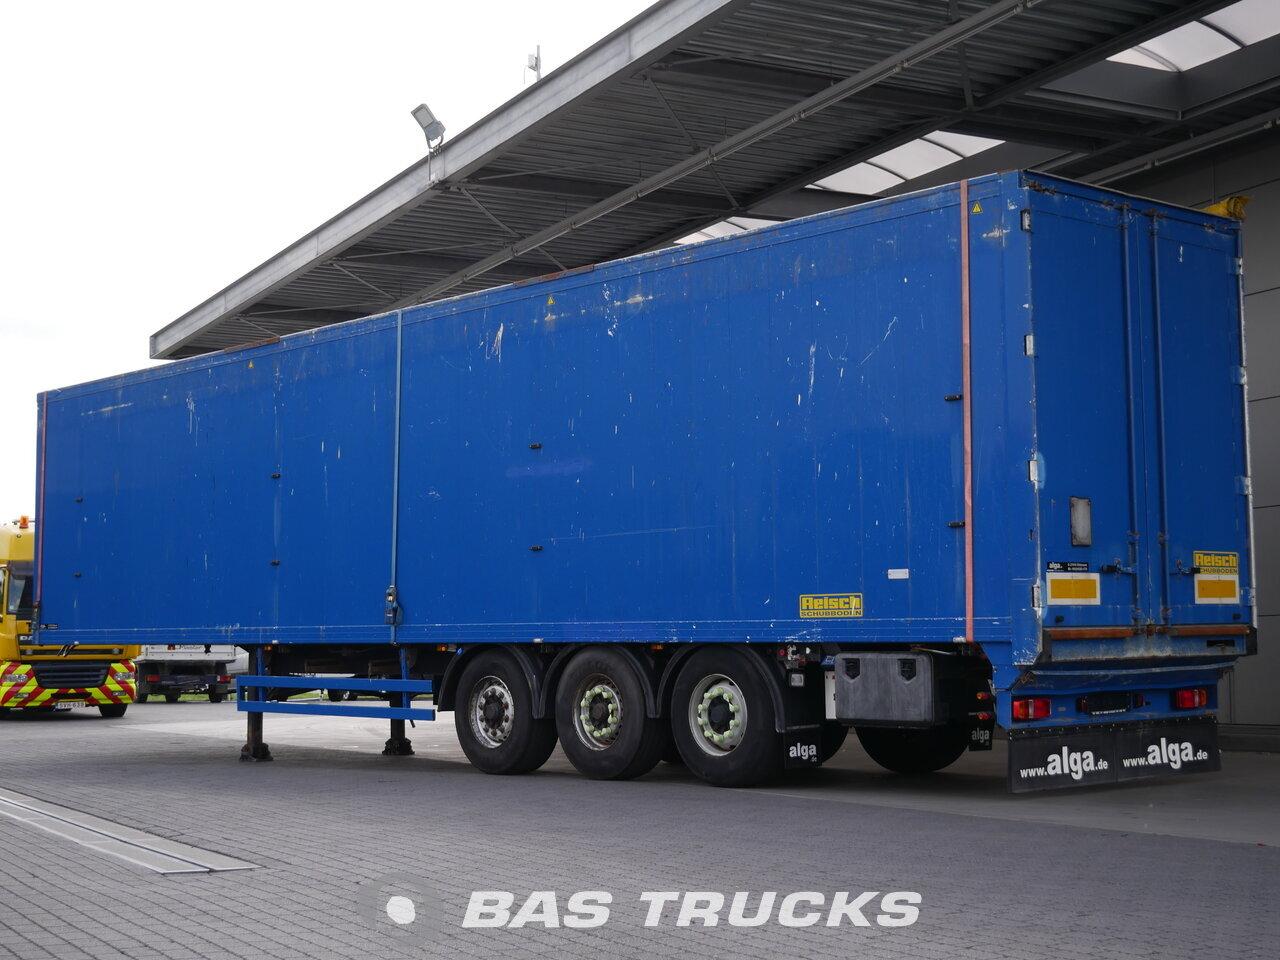 photo de Occasion Semi-remorques Reisch  91m3 Liftachse CargoFloor RSBS-35/24LK Essieux 2010